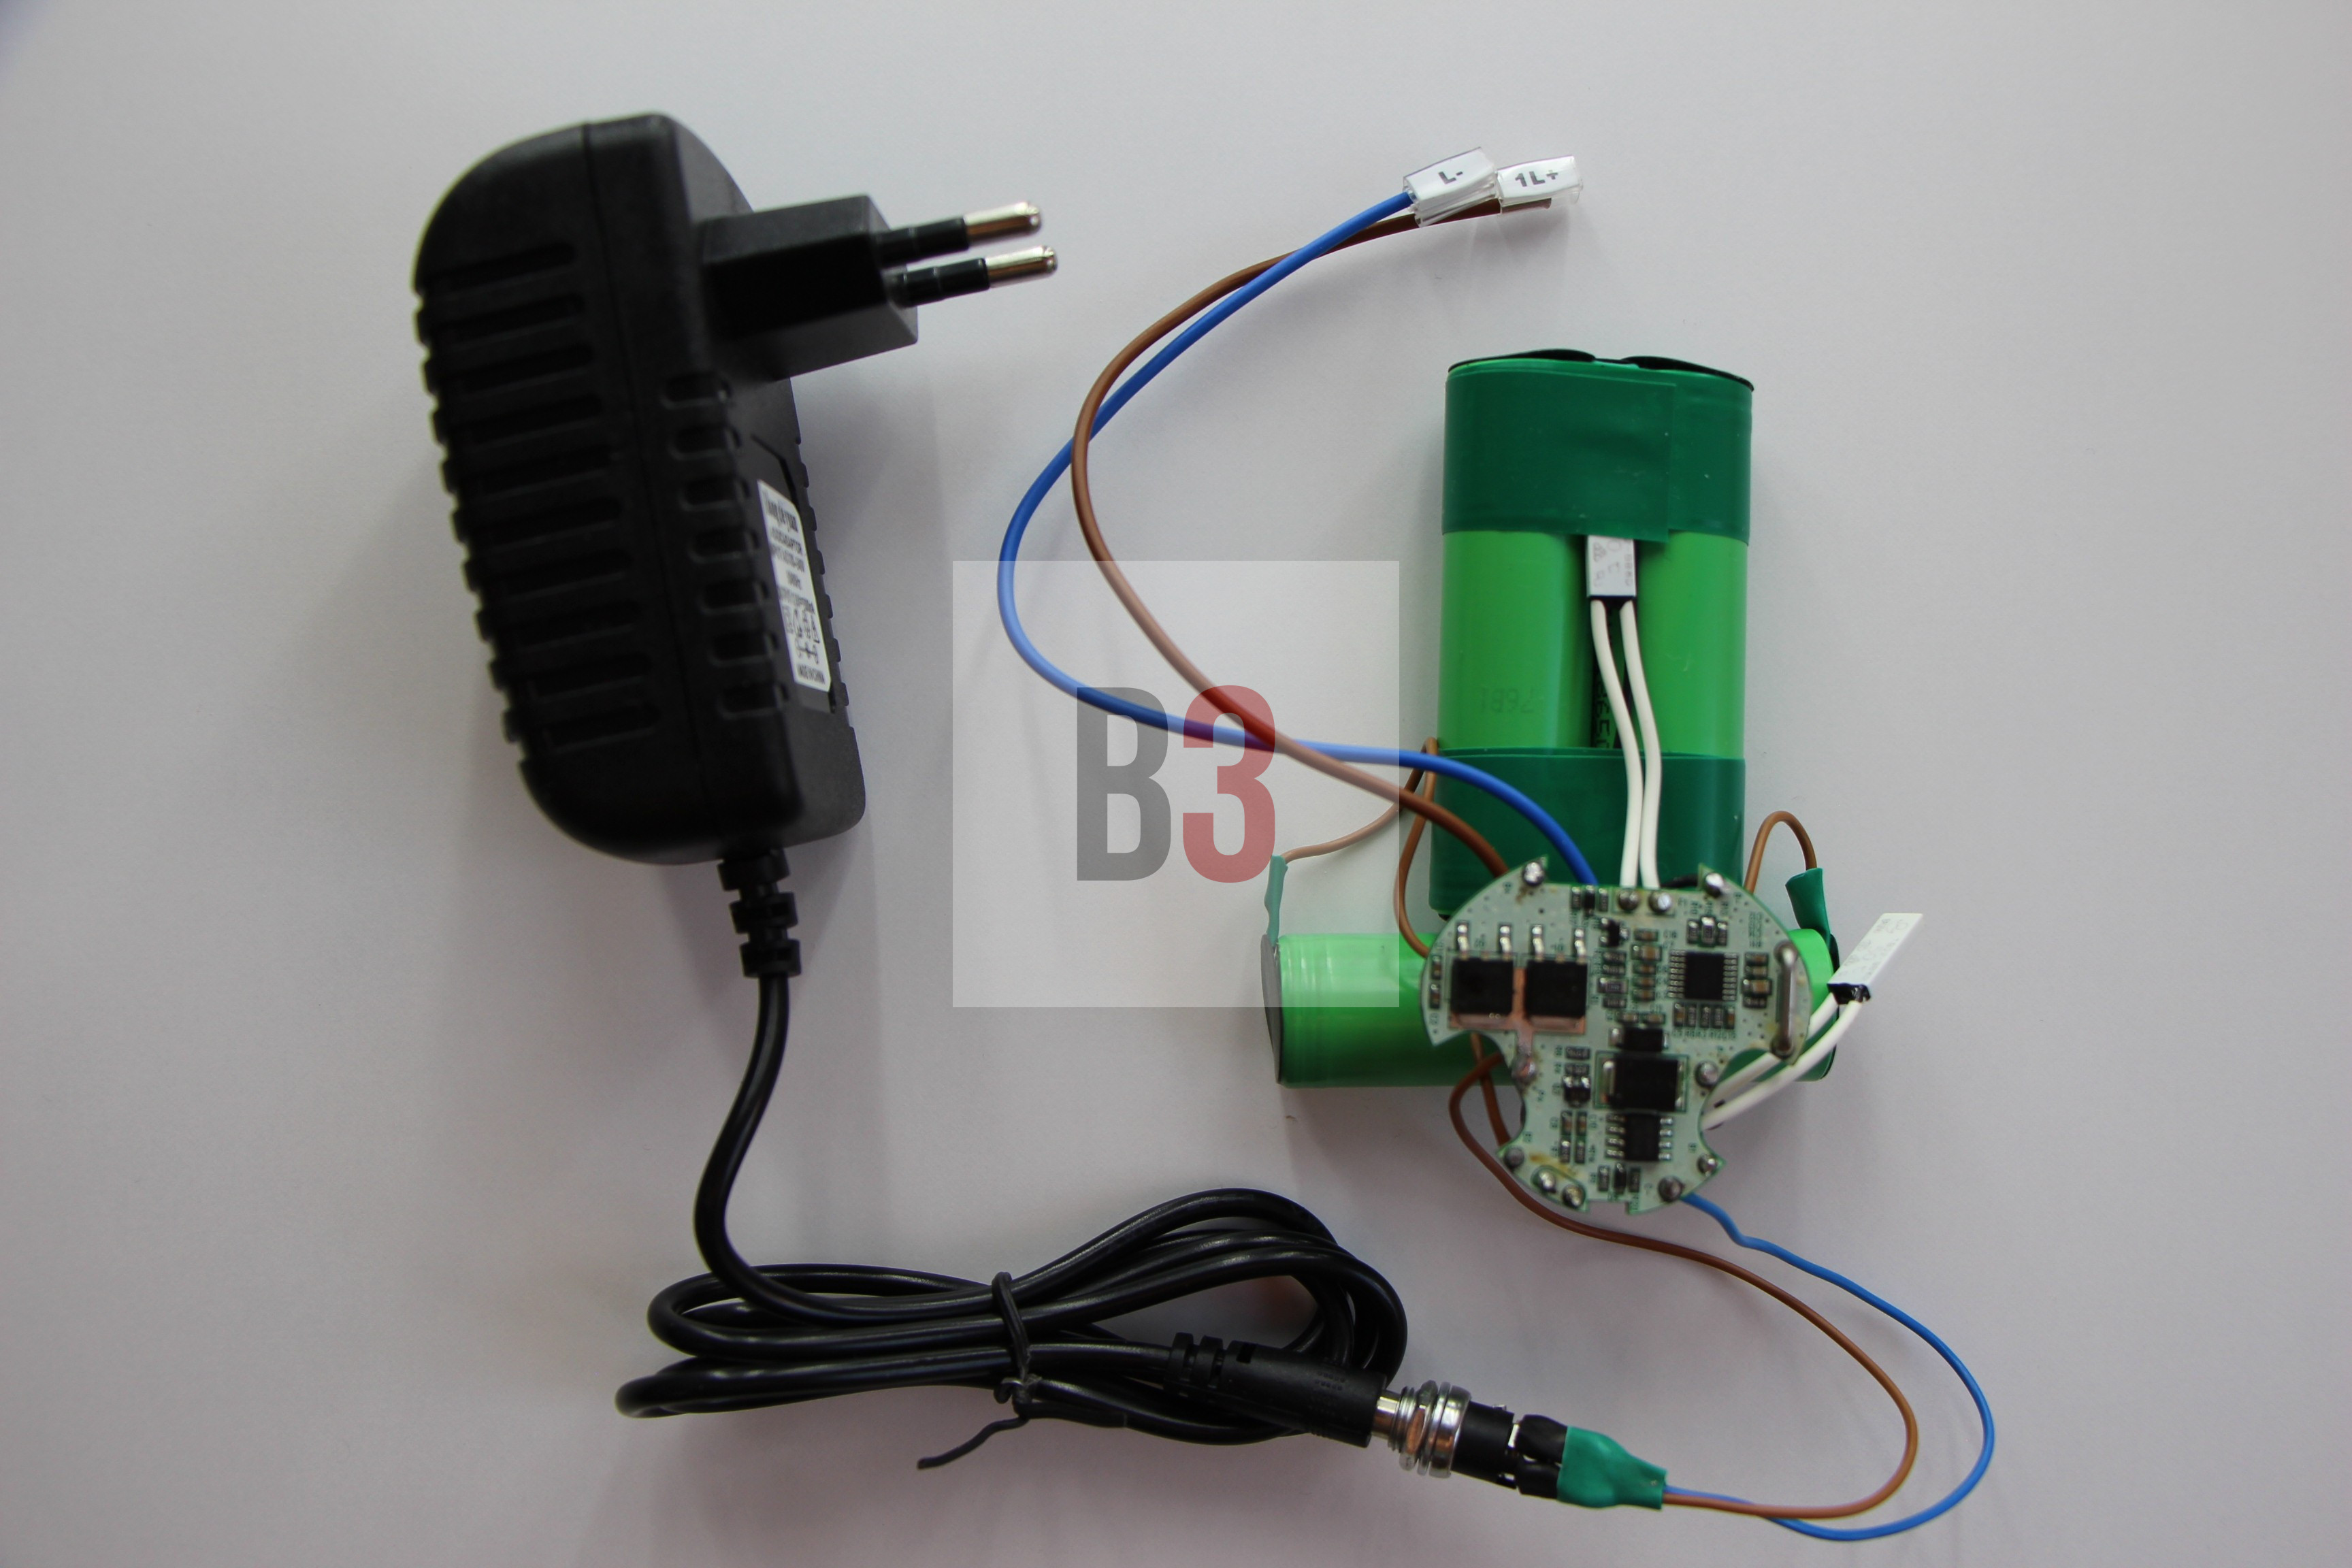 Перевод (переделка) с ni-cd на li-ion аккумуляторы